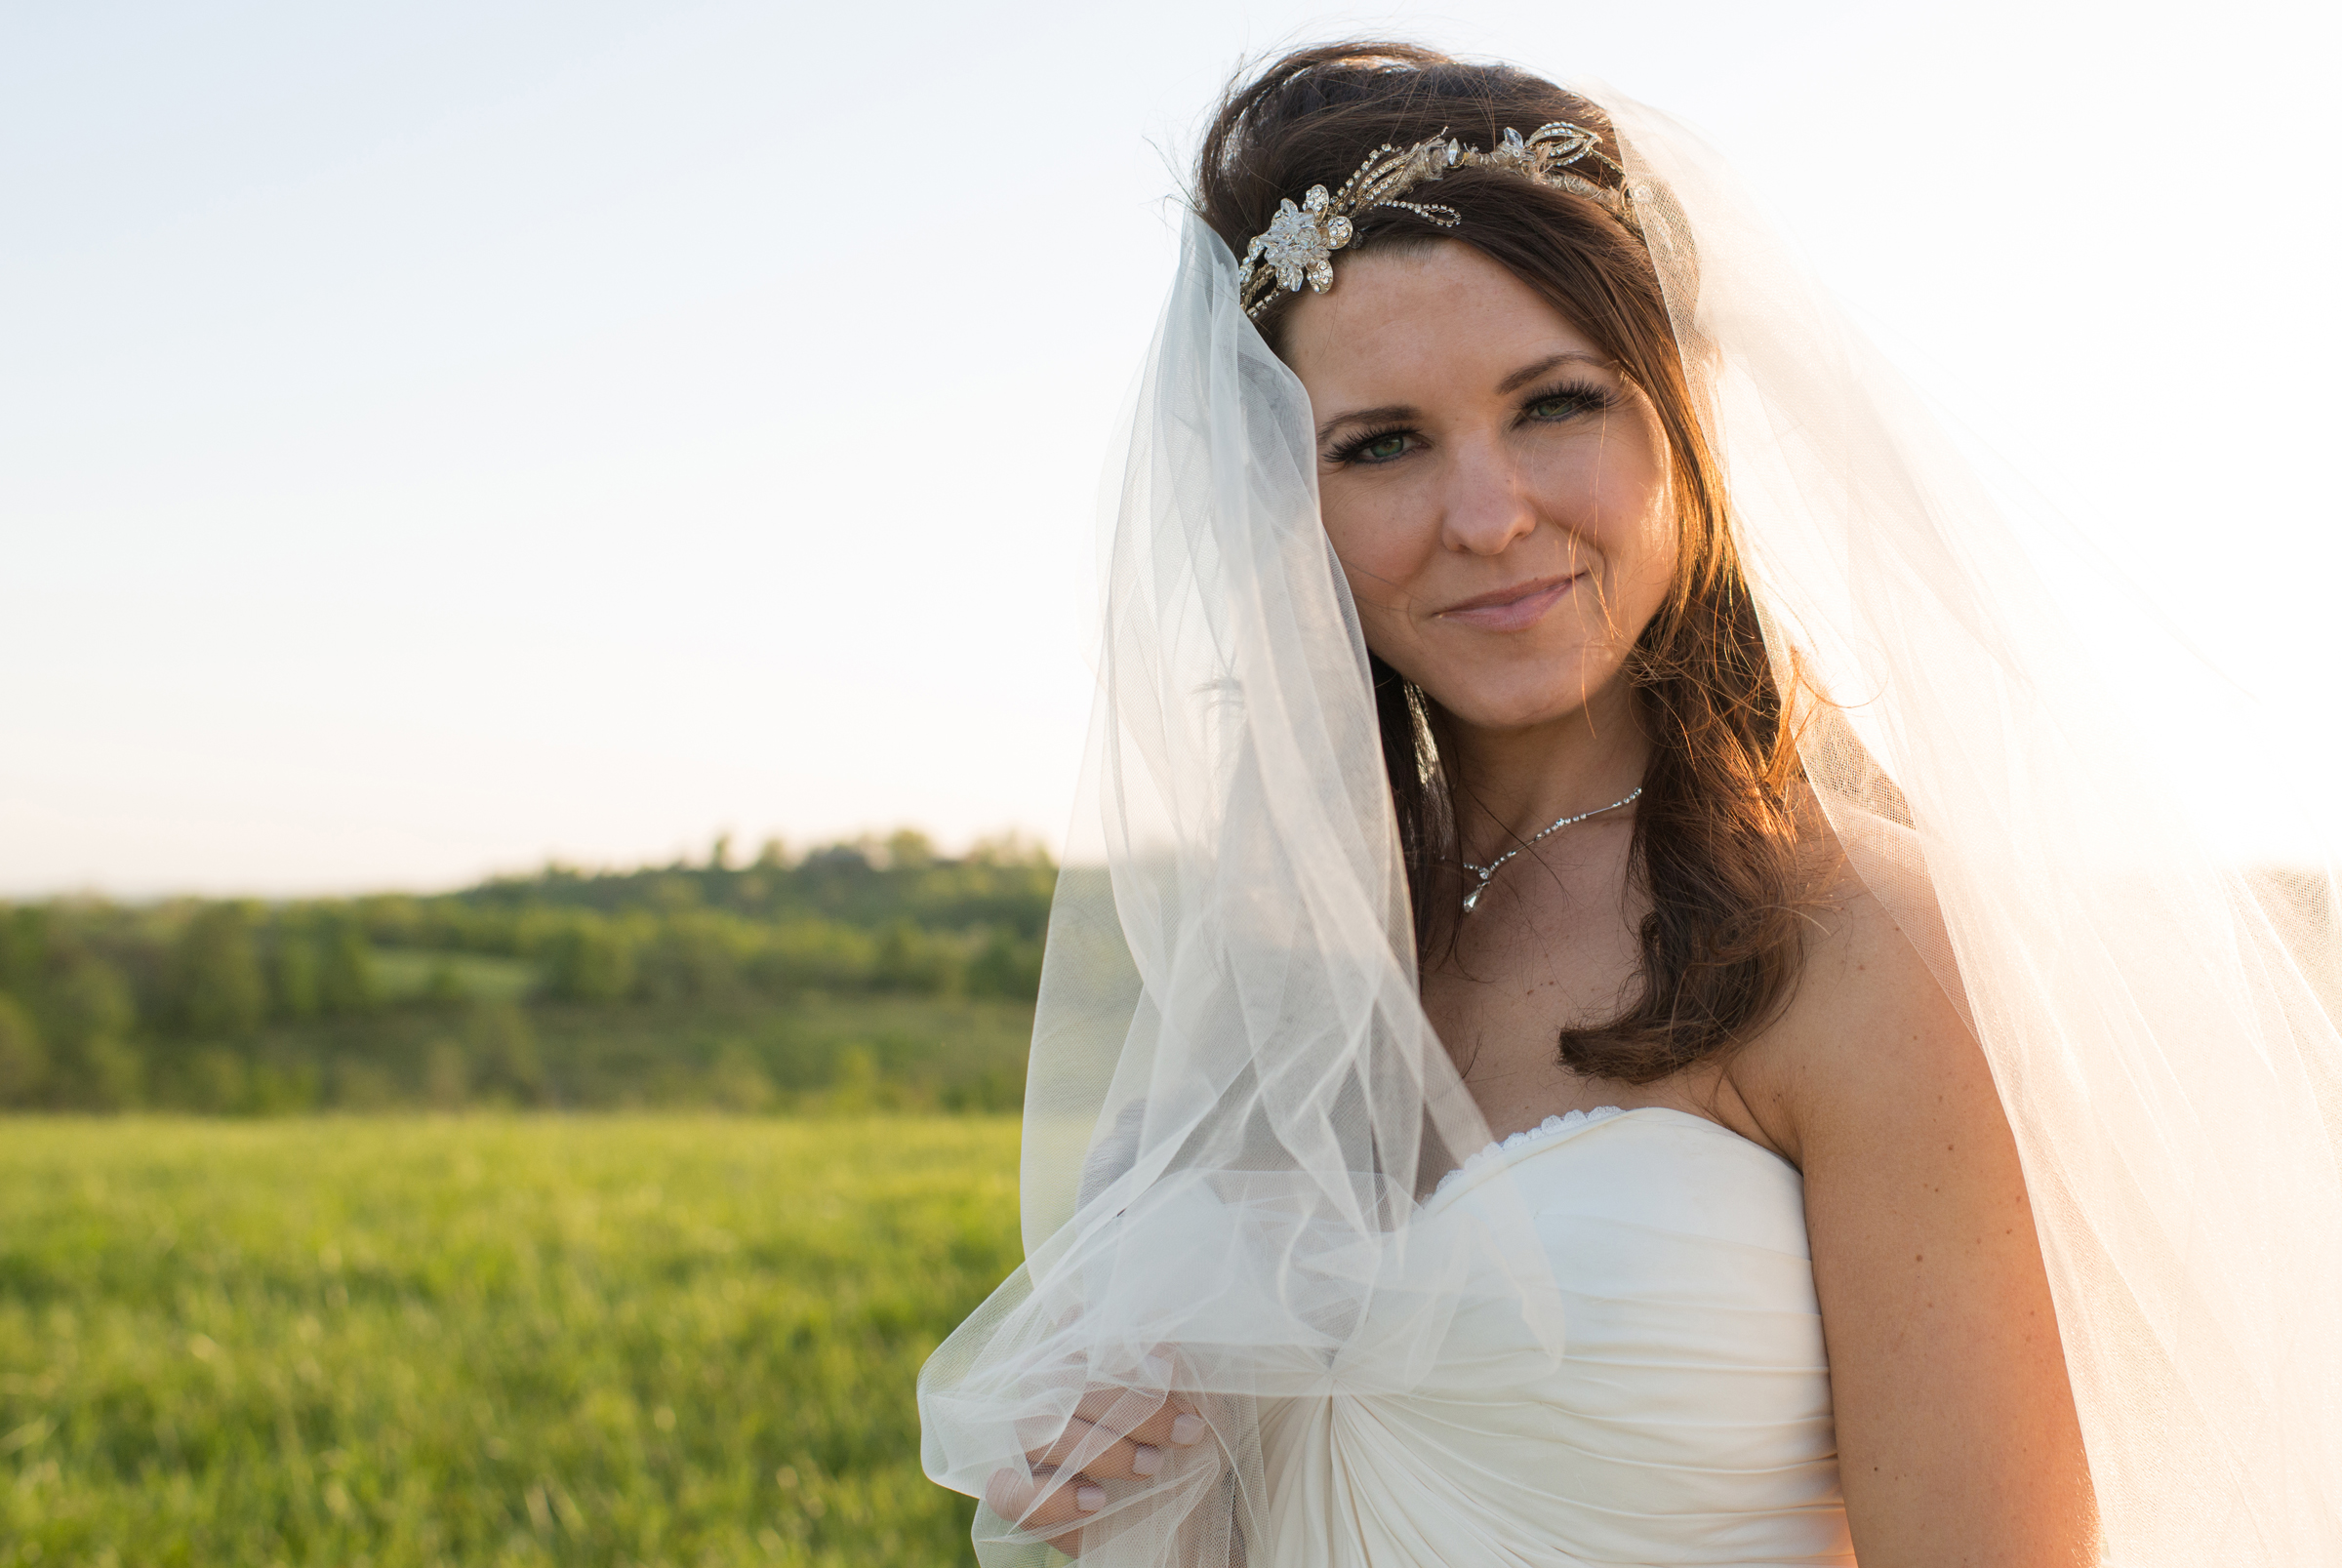 Bridal sunset